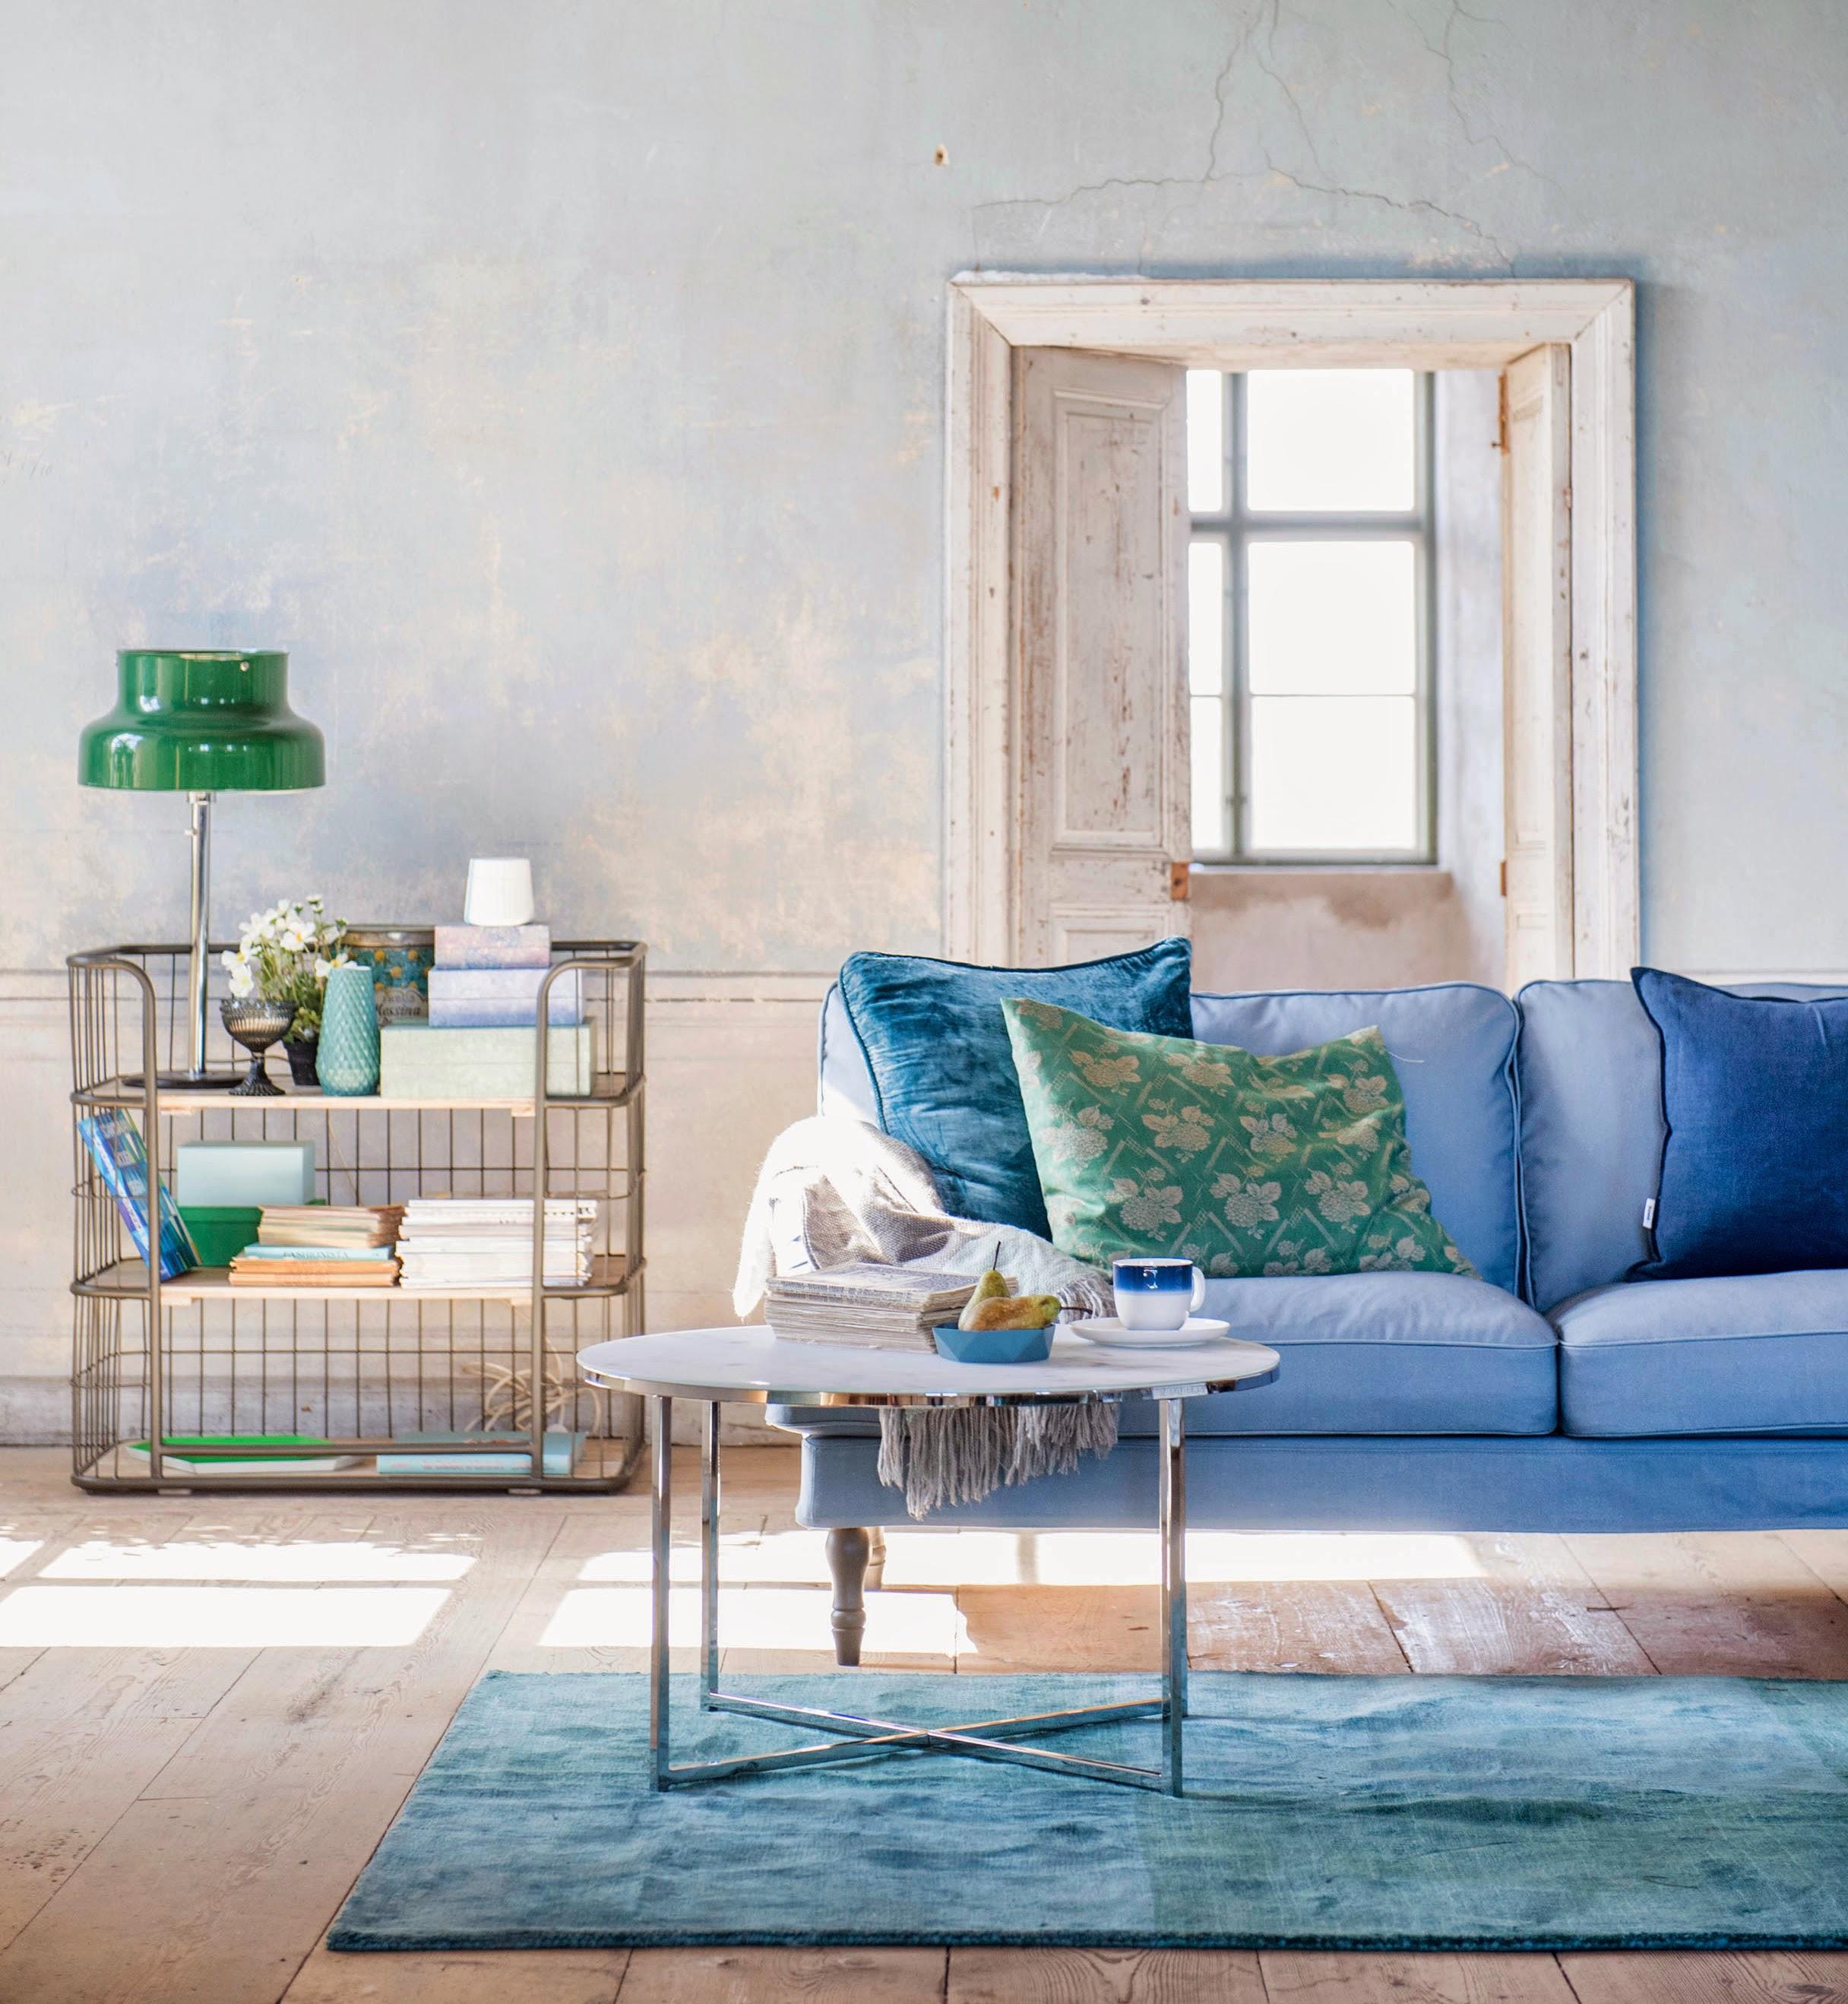 Steel Blue Stocksund sofa Bemz